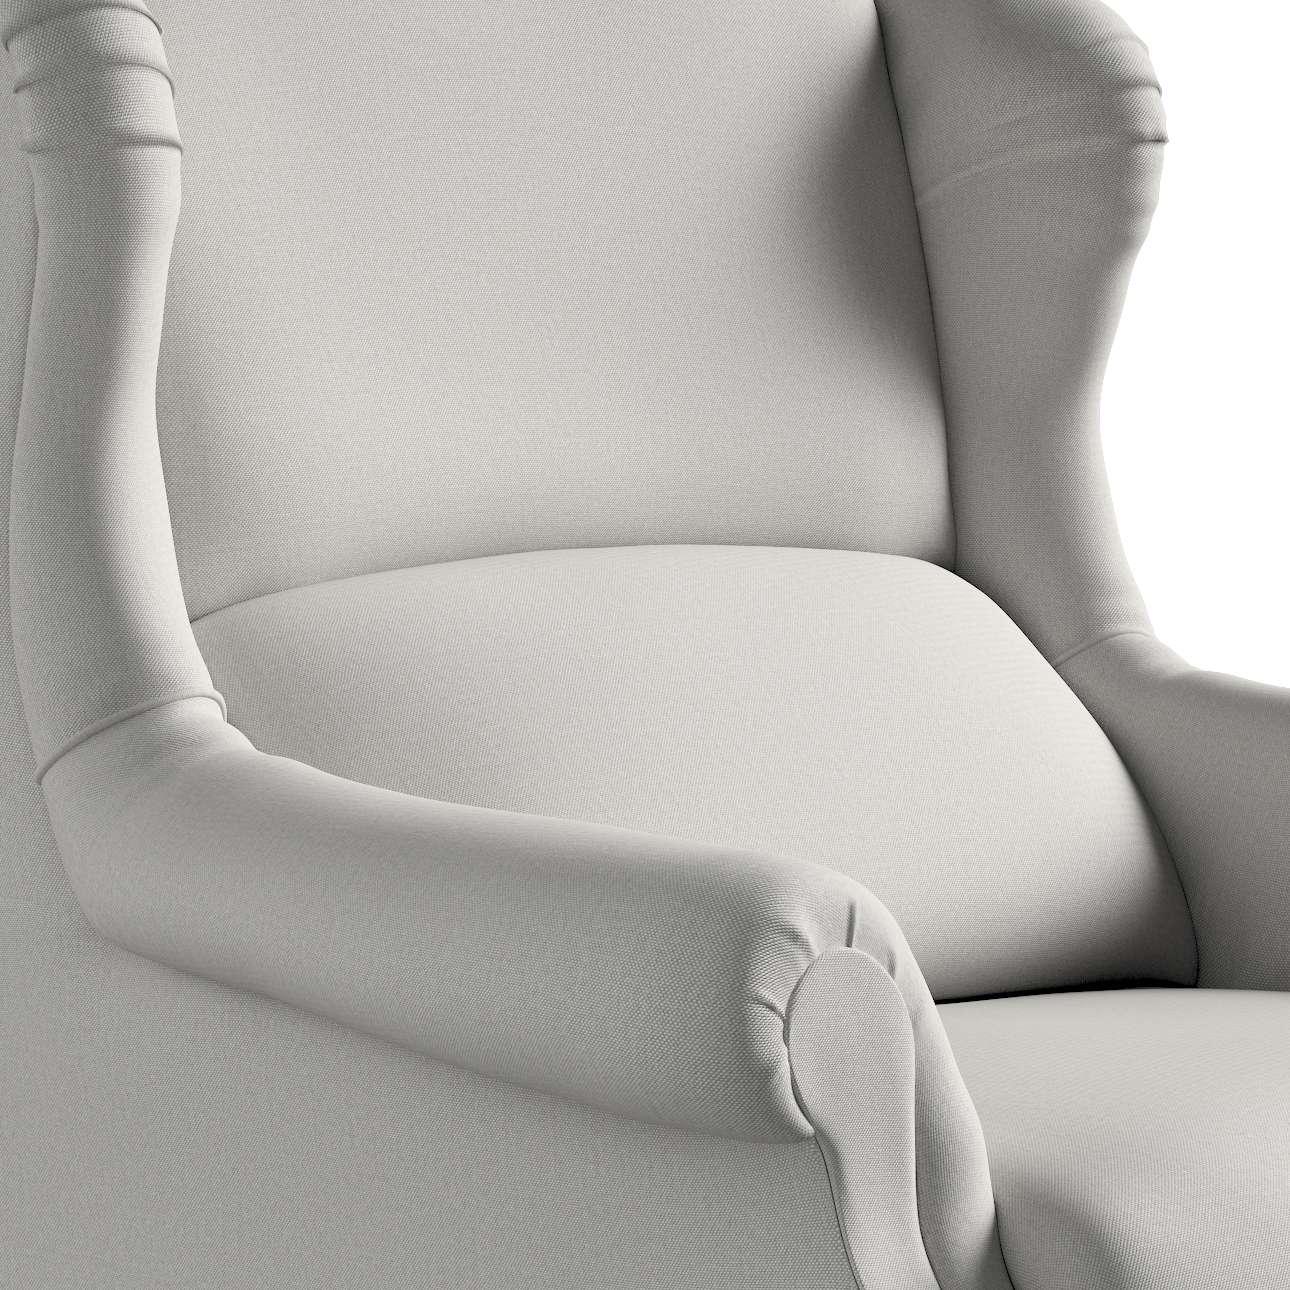 Stilingas Dekoria fotelis 63 x 115 cm kolekcijoje Etna , audinys: 705-90